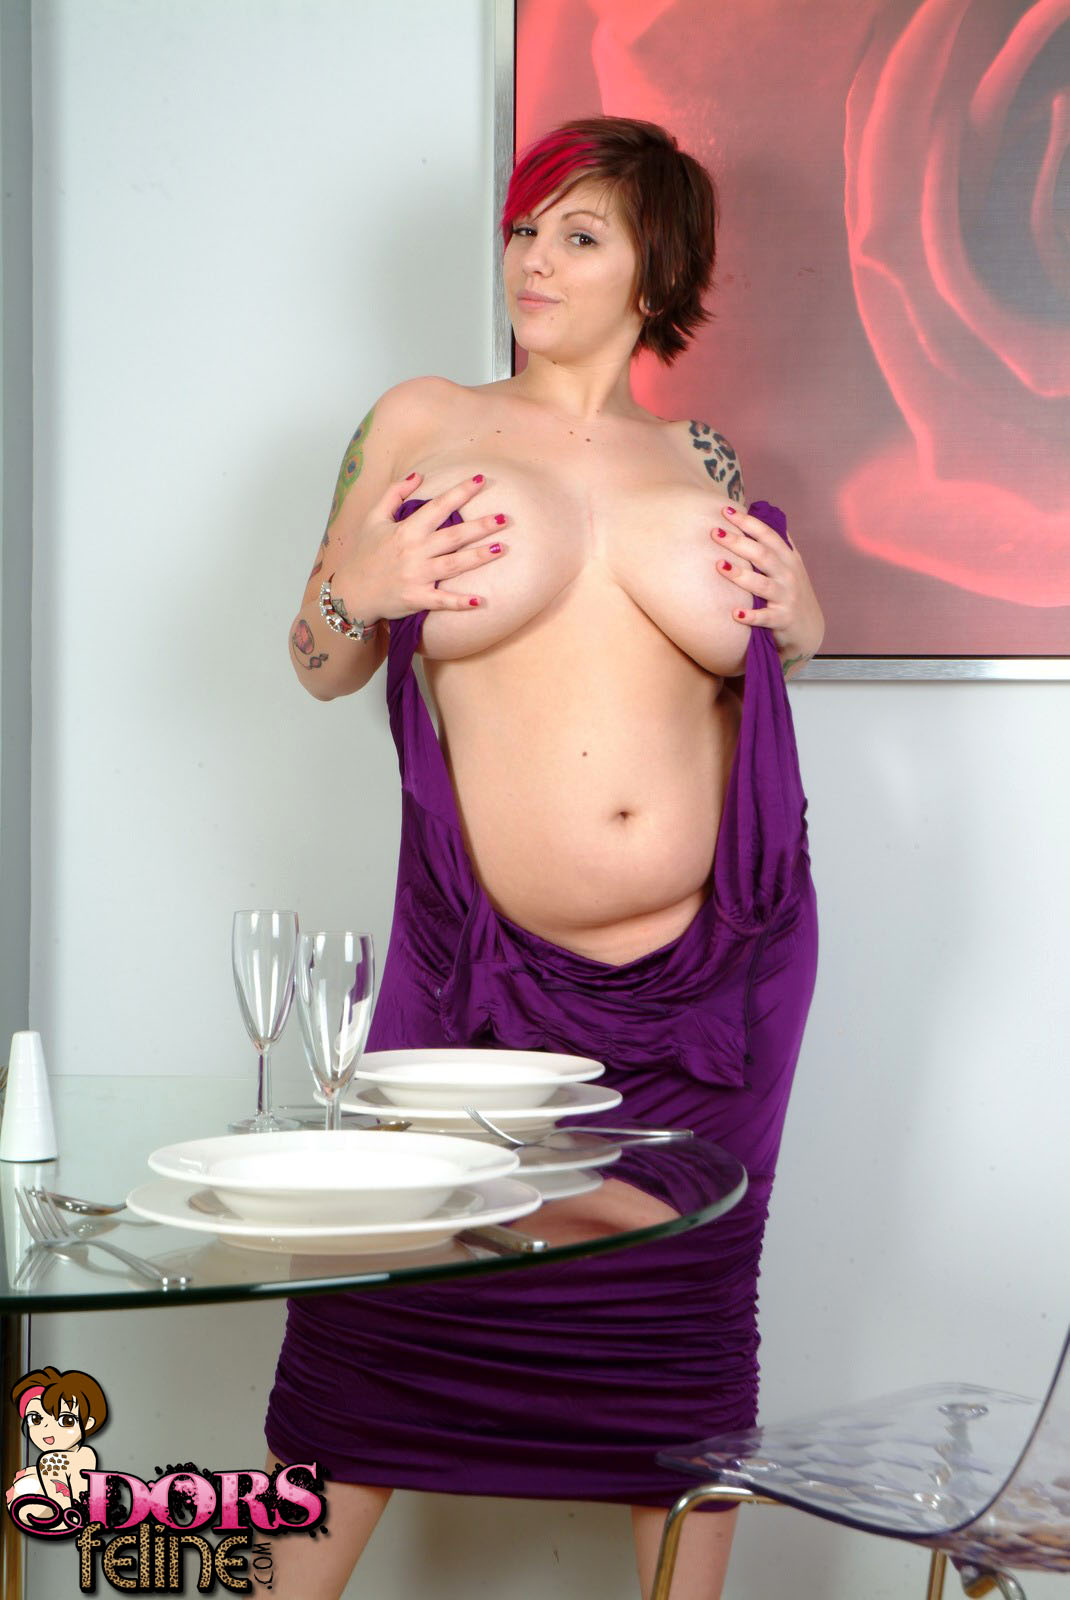 dinner plates women nude